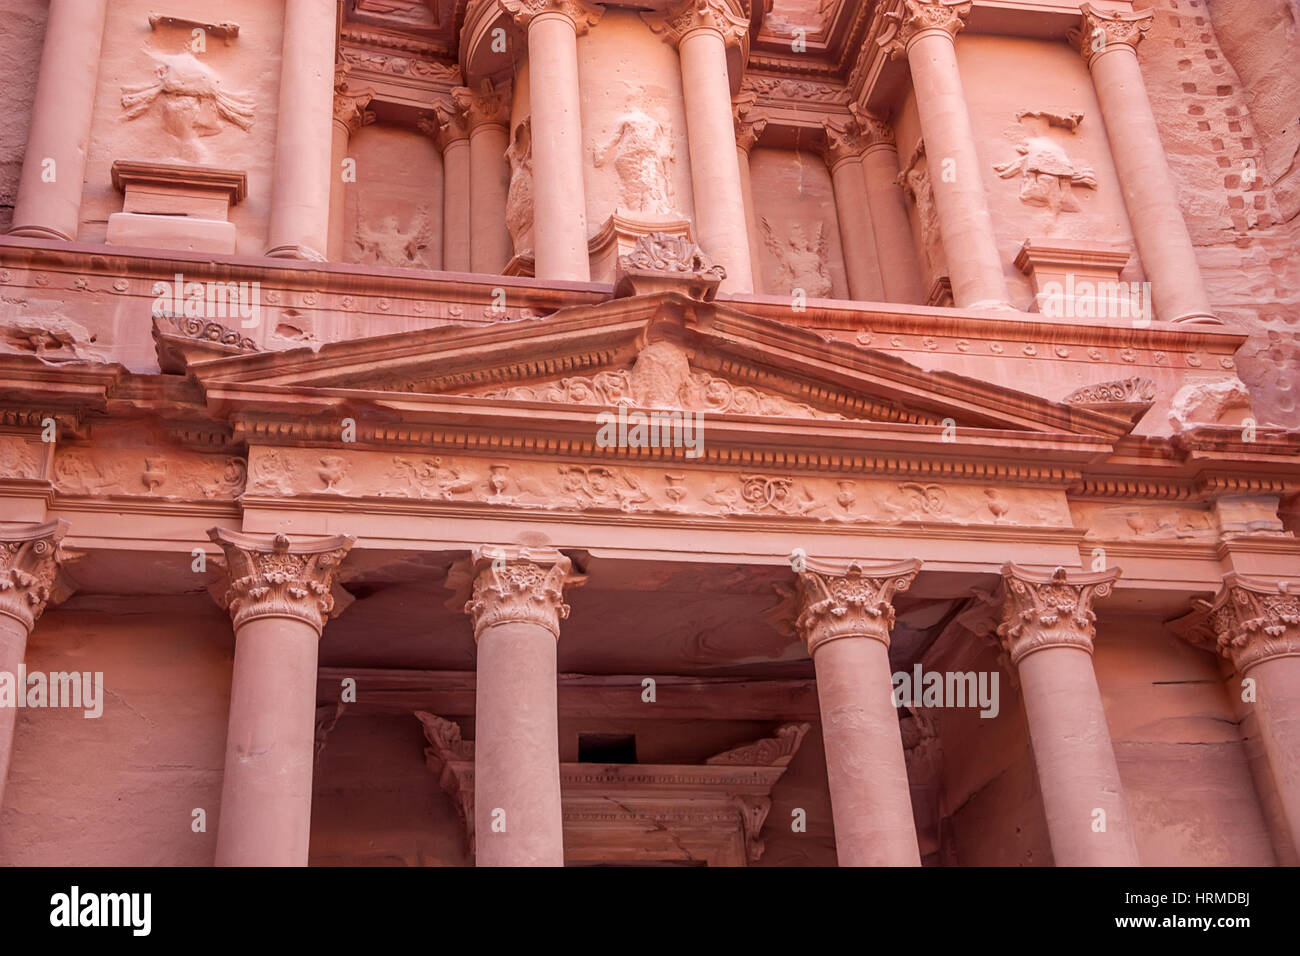 Detail of facade of famous tomb Al-Khazneh or Treasury in Petra, Jordan - Stock Image